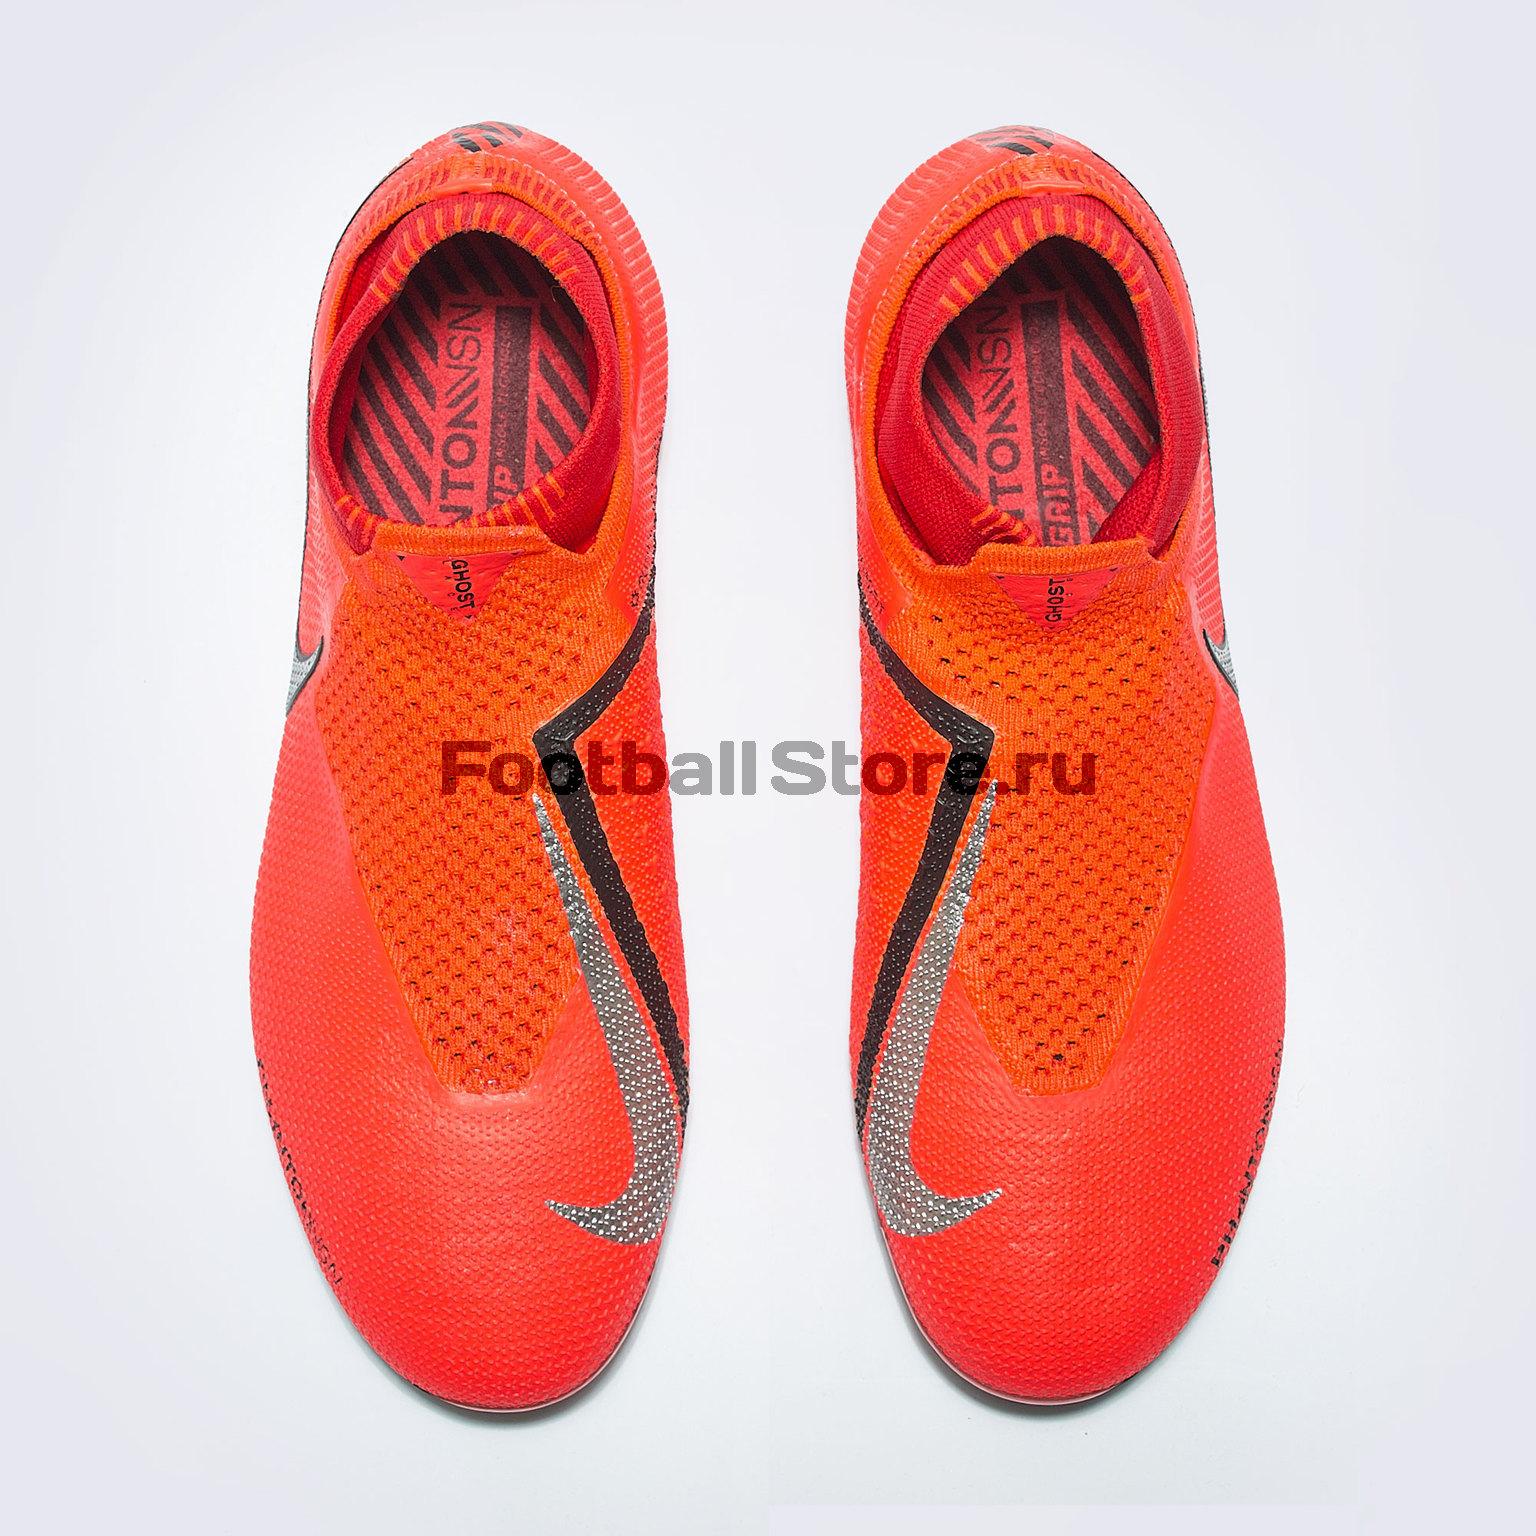 Бутсы Nike Phantom Vision Elite DF FG AO3262-600 – купить бутсы в ... a4a4e3786529e